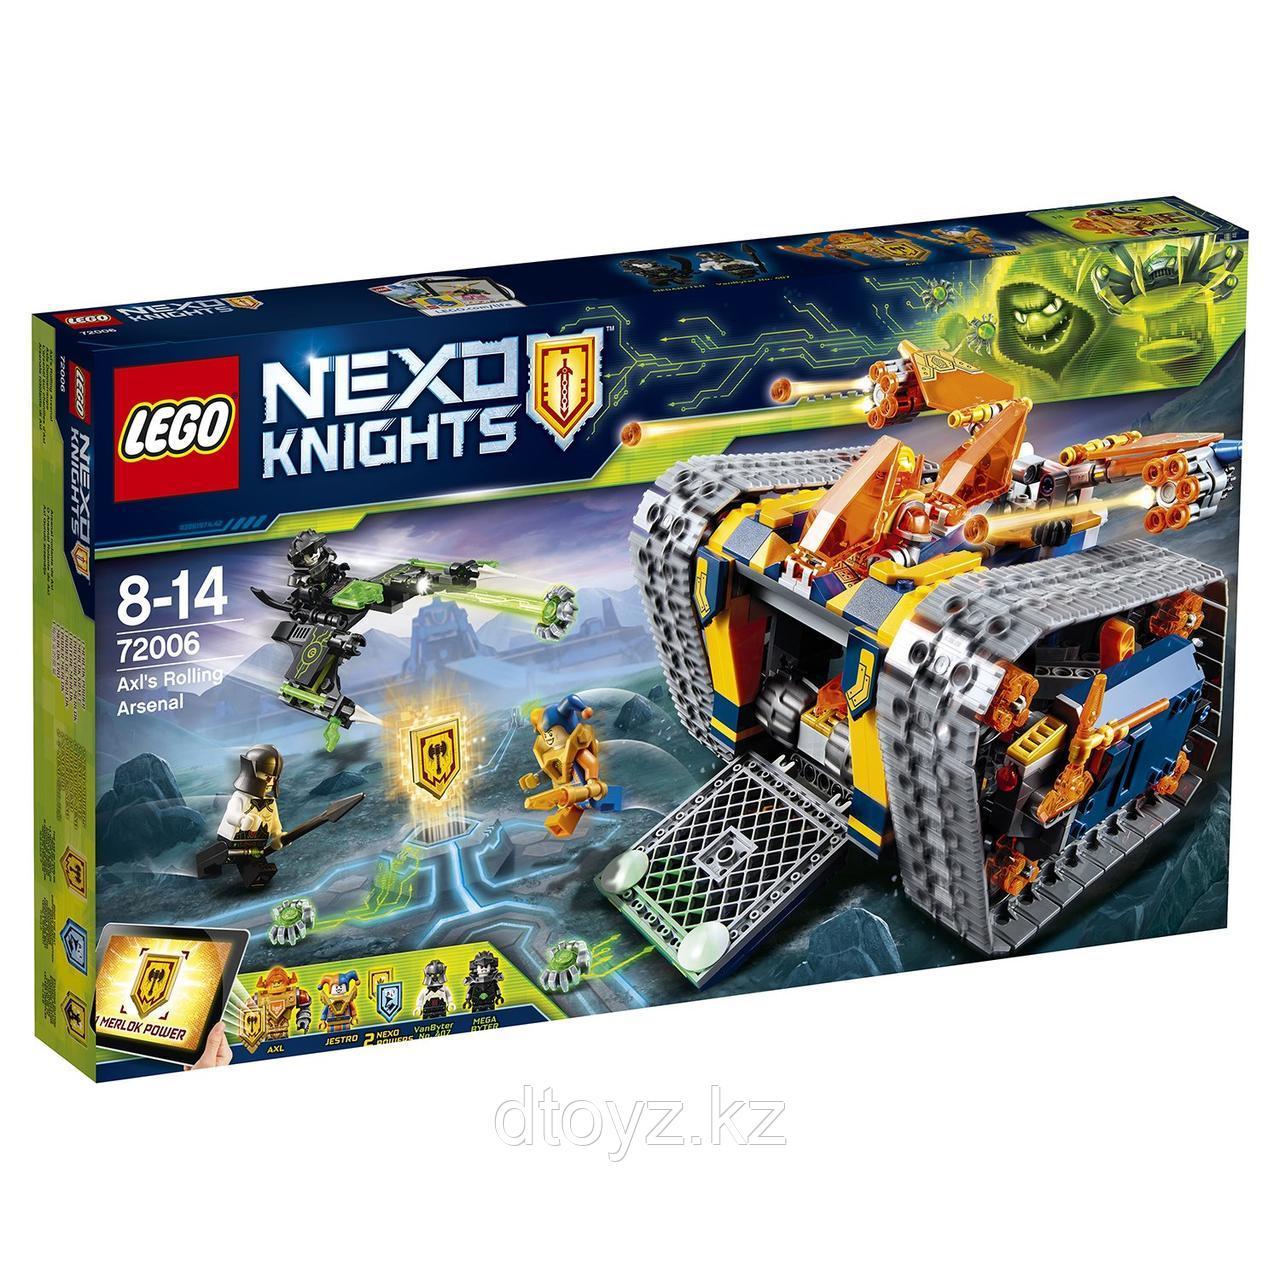 Lego Nexo Knights 72006 Мобильный арсенал Акселя